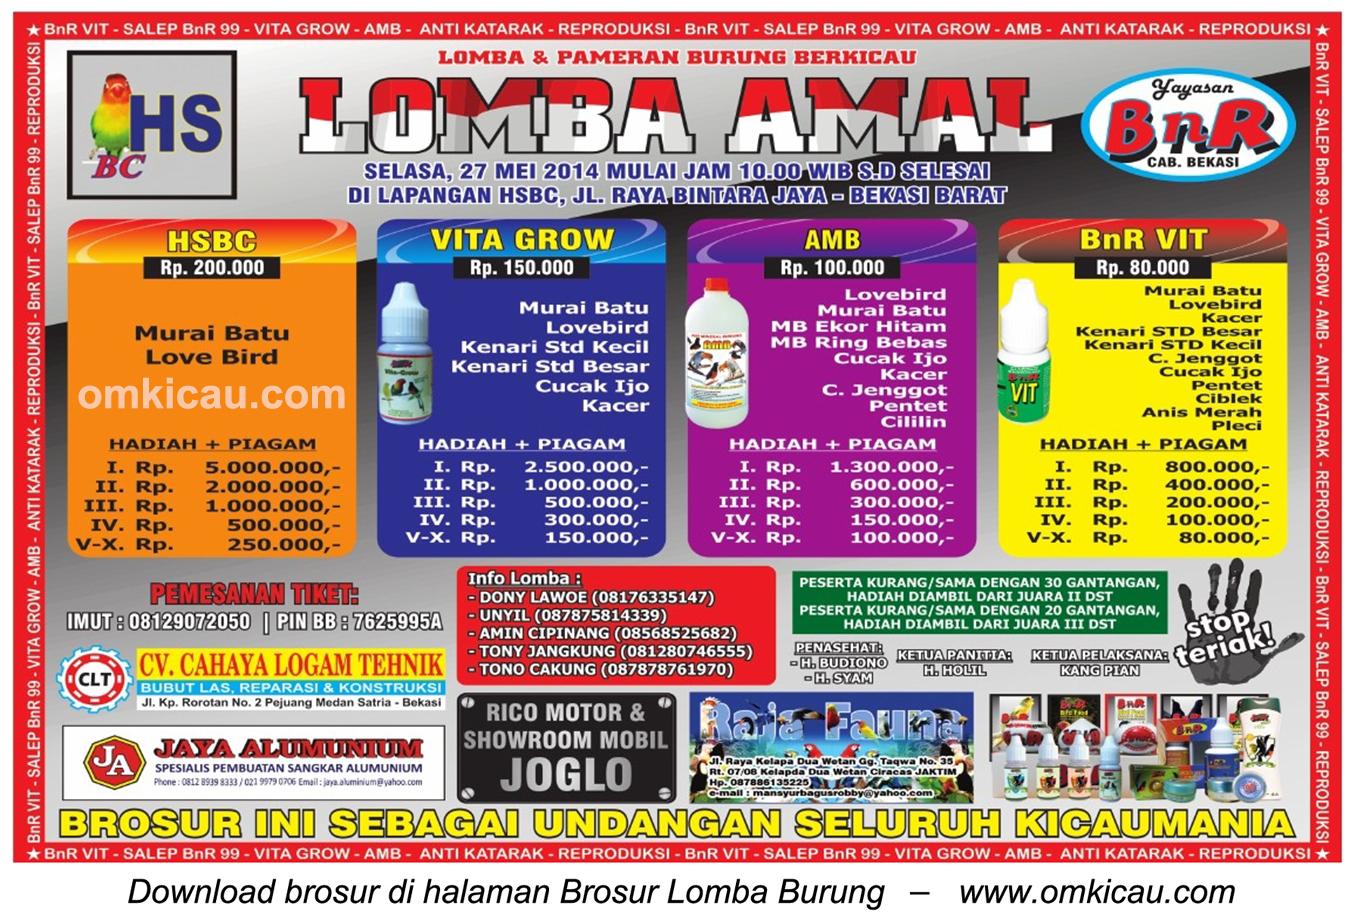 Brosur Lomba Amal Burung Berkicau HSBC-BnR - Bekasi Barat, 27 Mei 2014